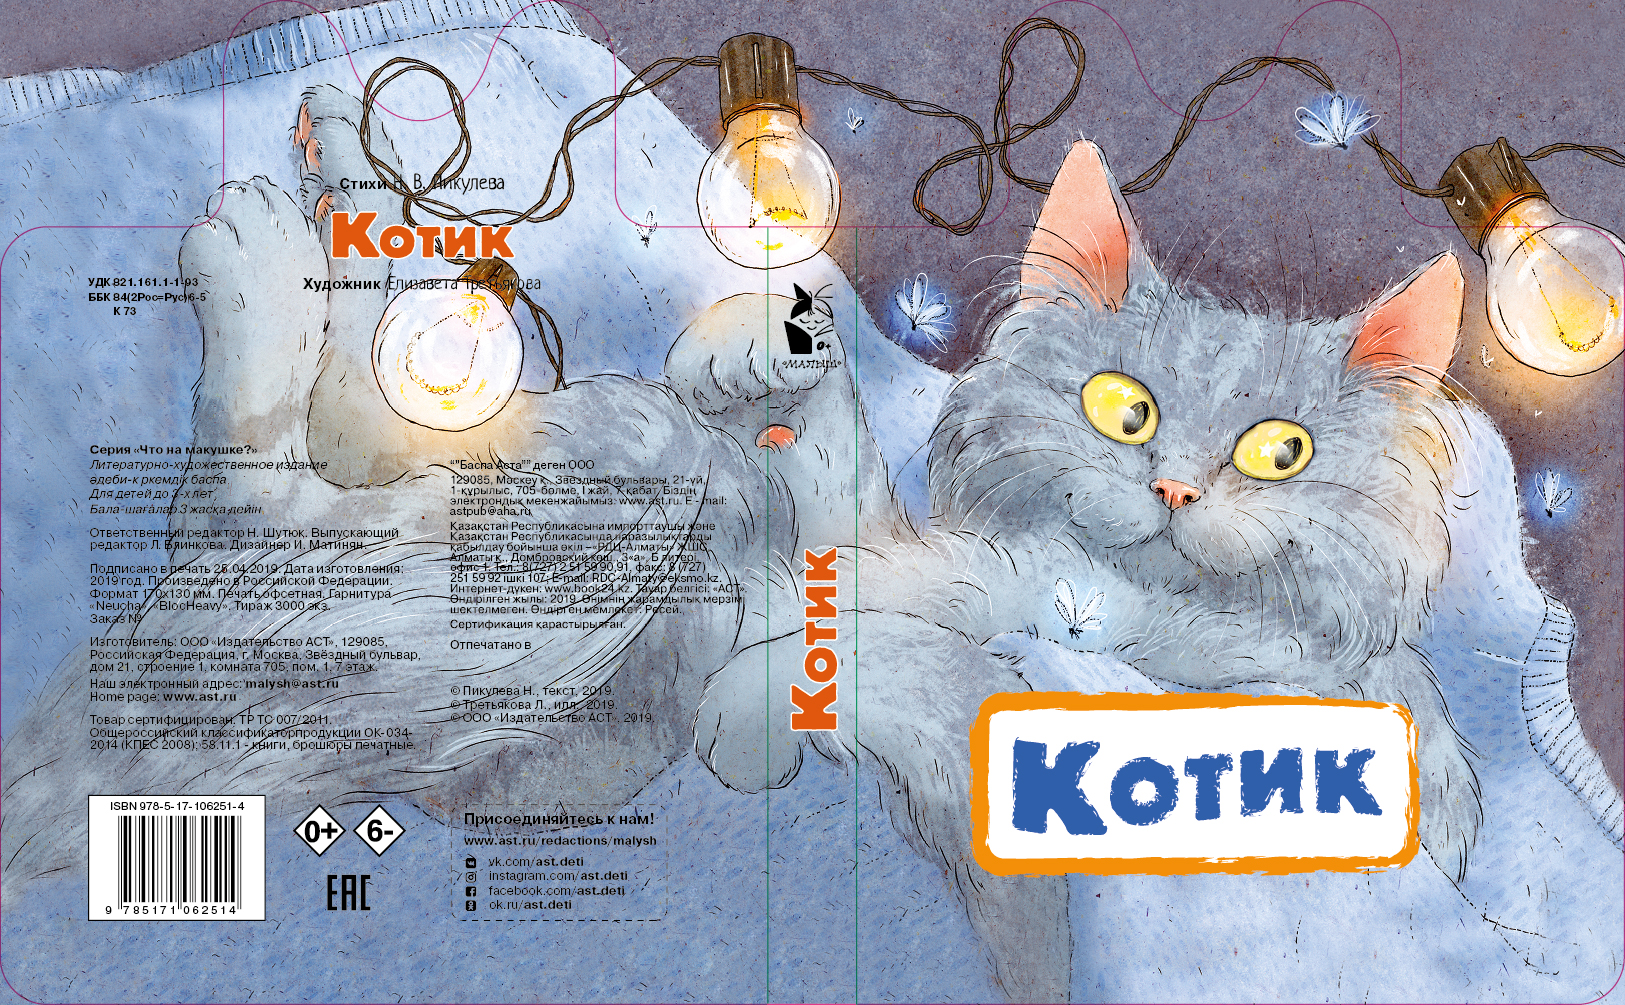 Kotik Cover new-01